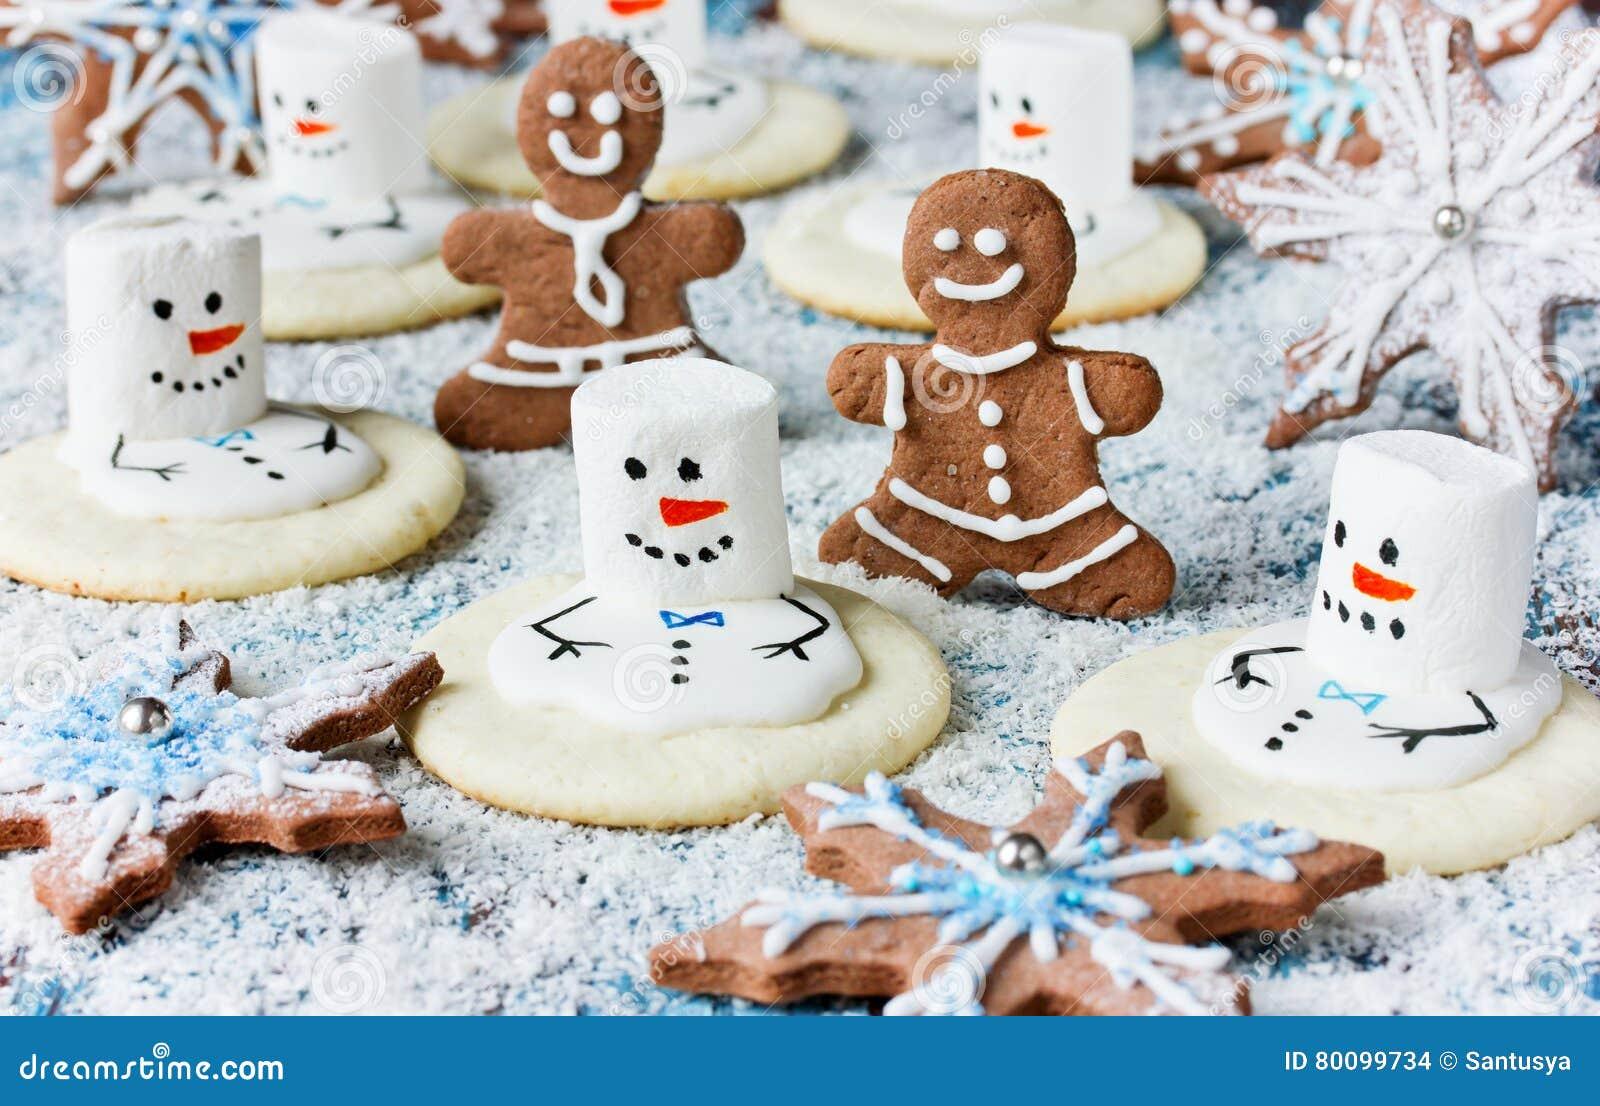 Christmas Cookies - melting snowman, gingerbread man, snowflake